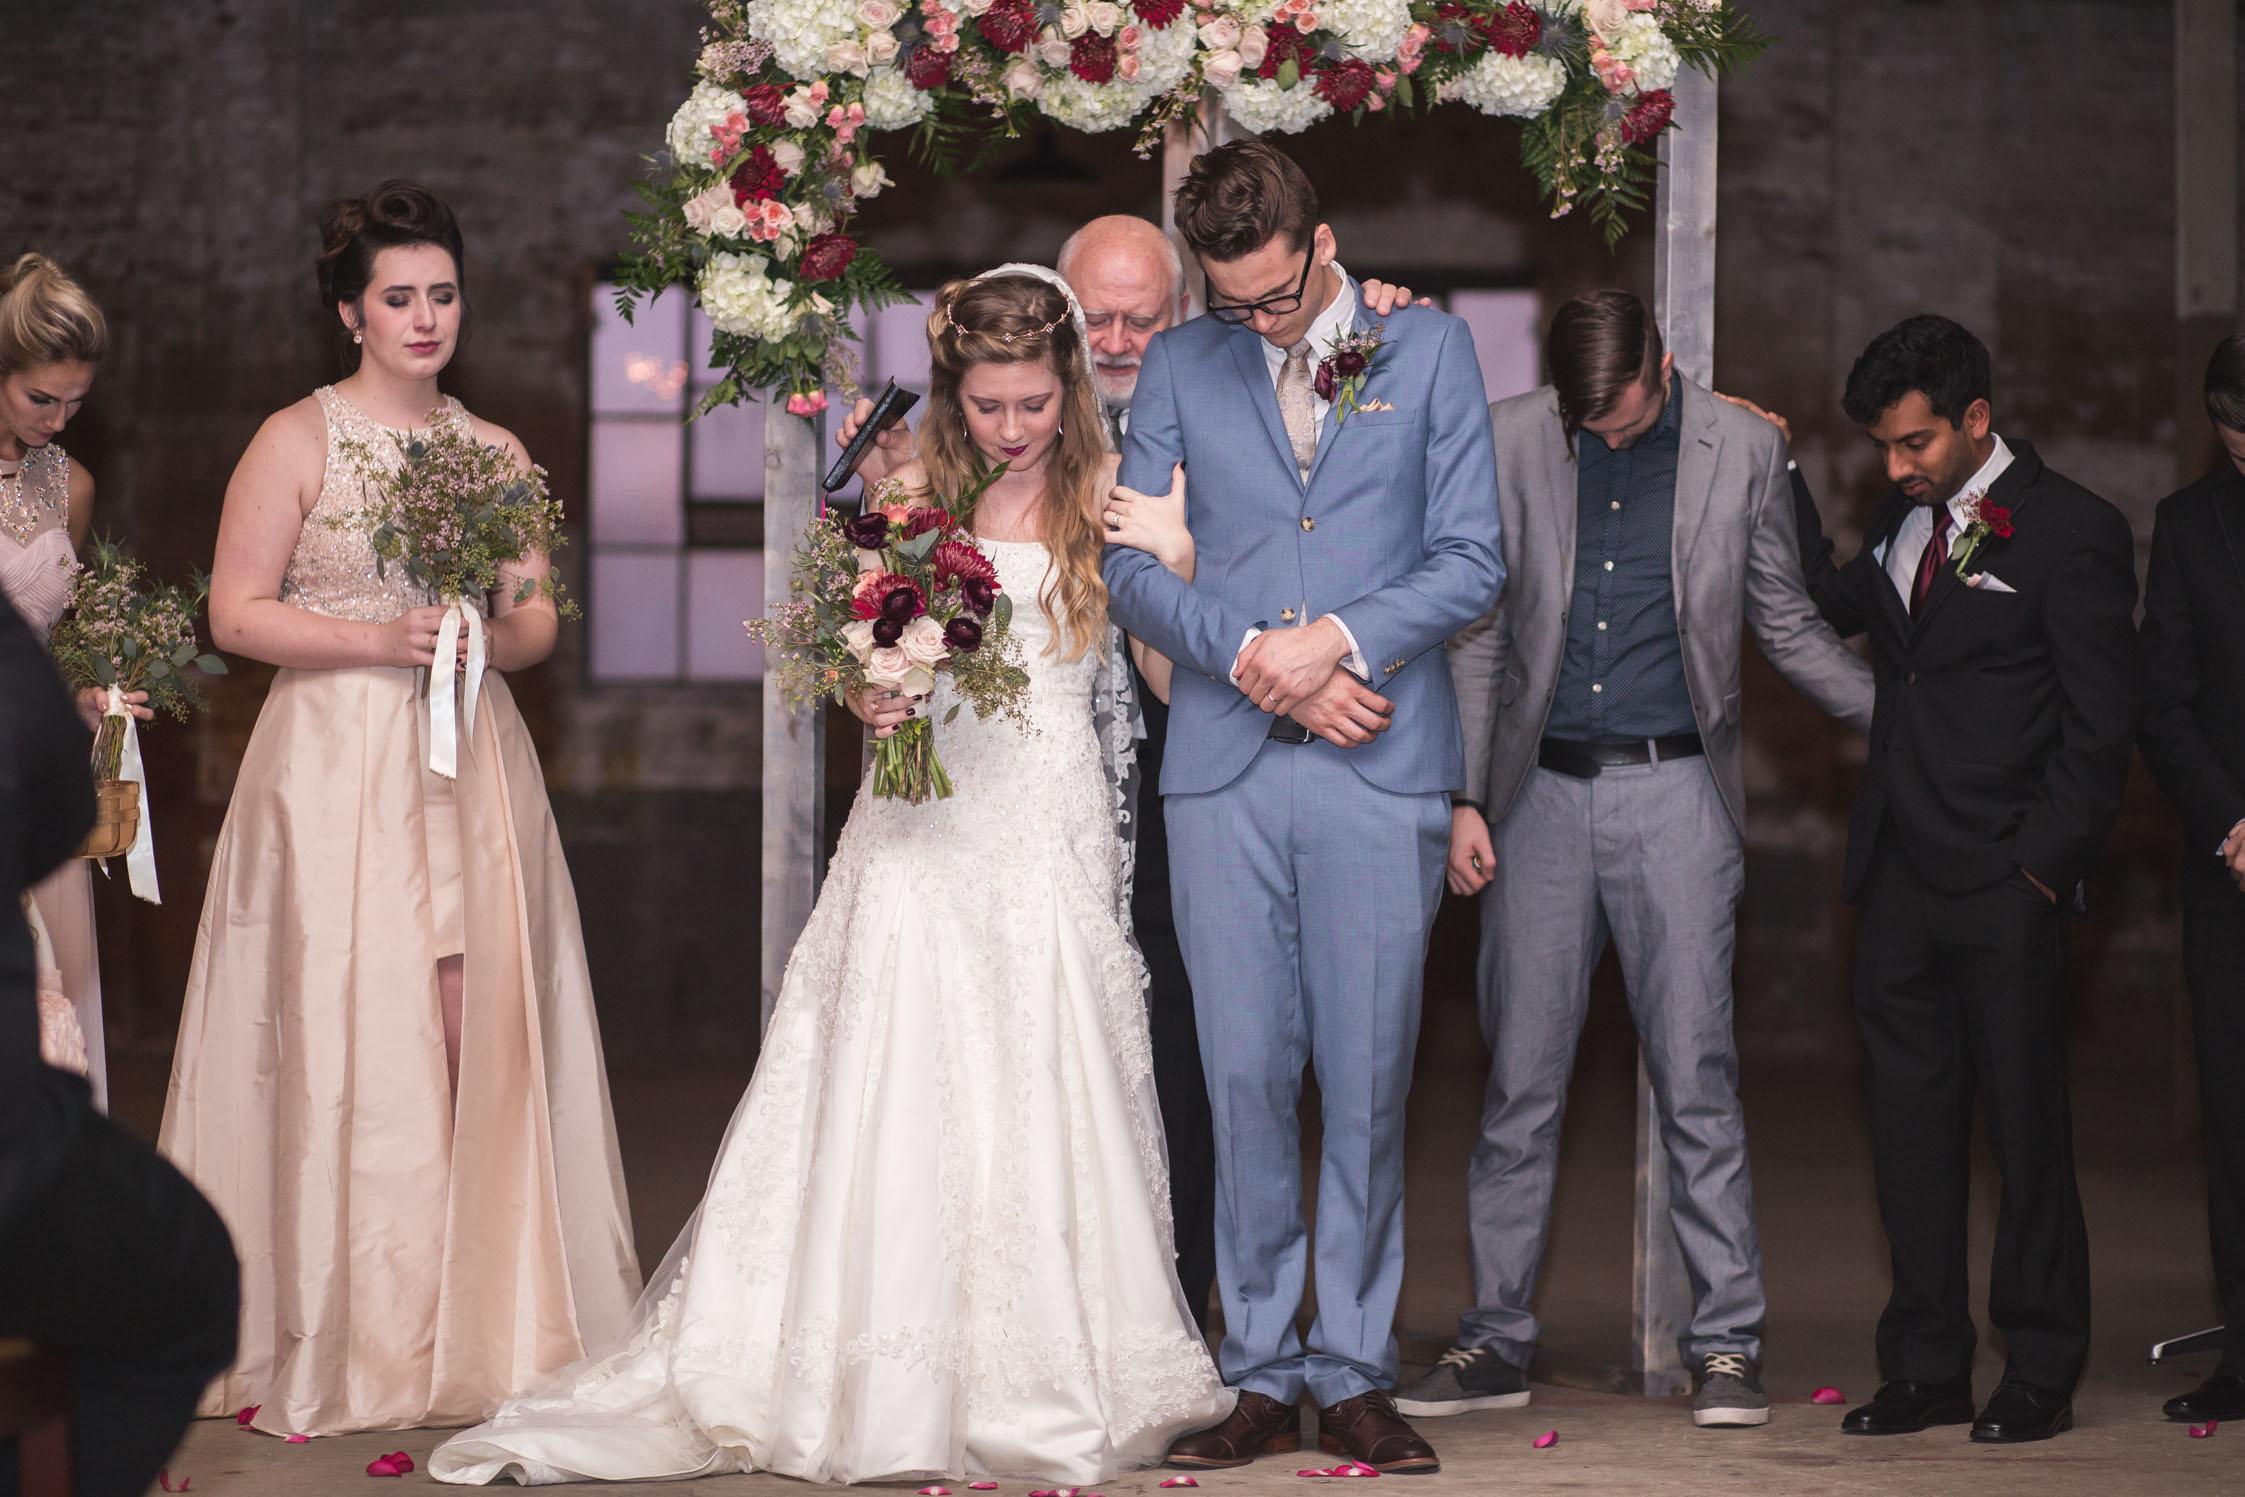 Adam-Szrmack-The-Glass-Factory-Wedding-115.jpg